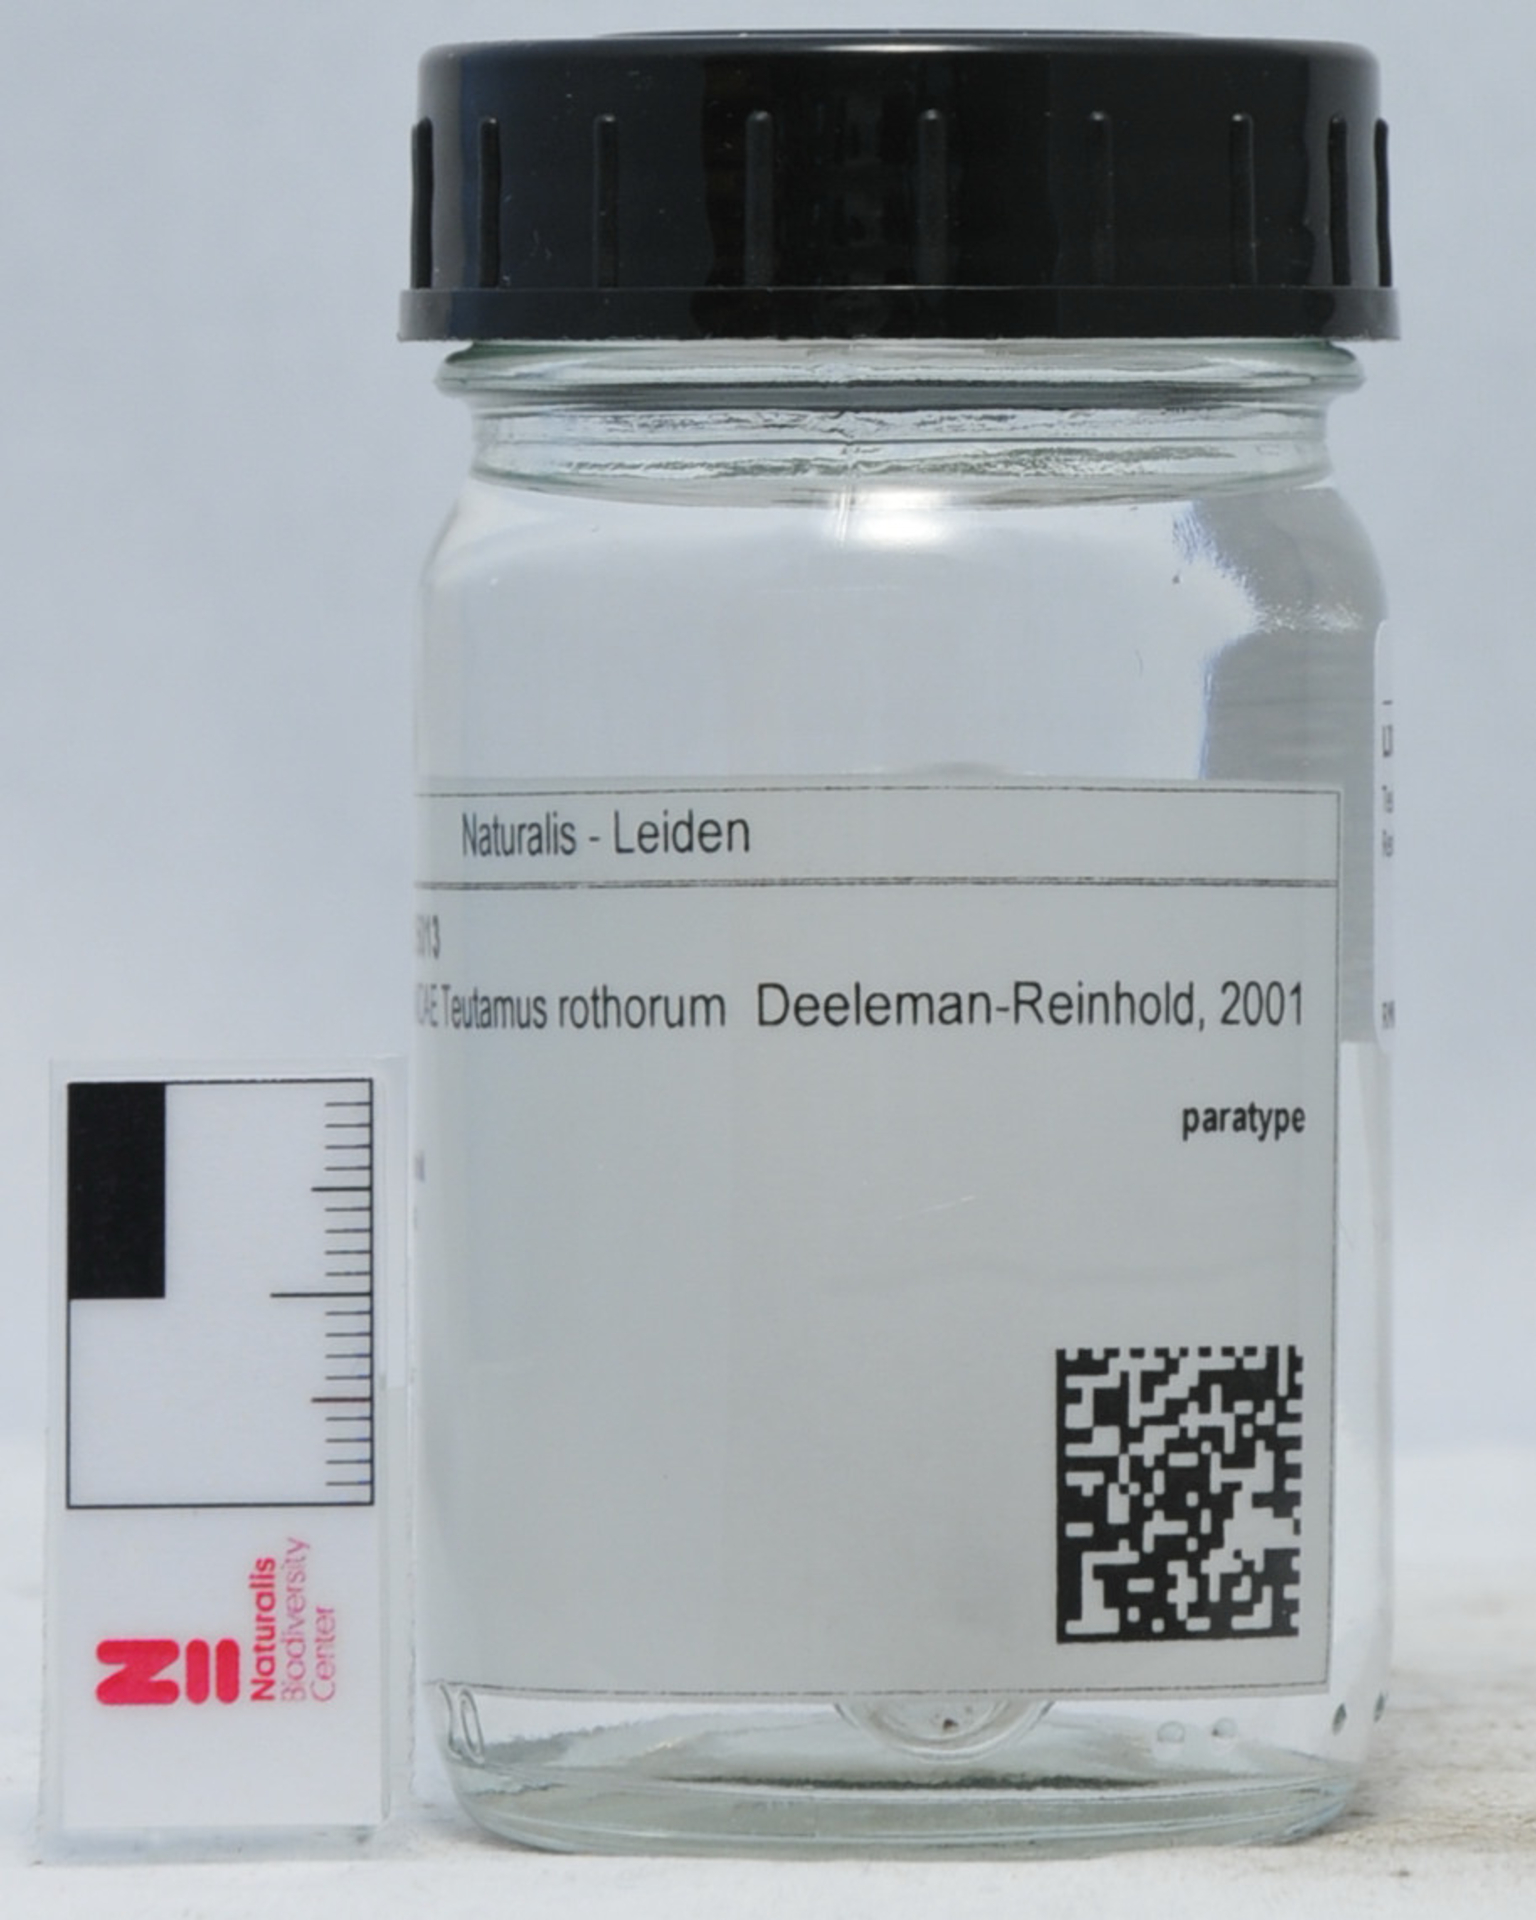 RMNH.ARA.15013   Teutamus rothorum Deeleman-Reinhold, 2001